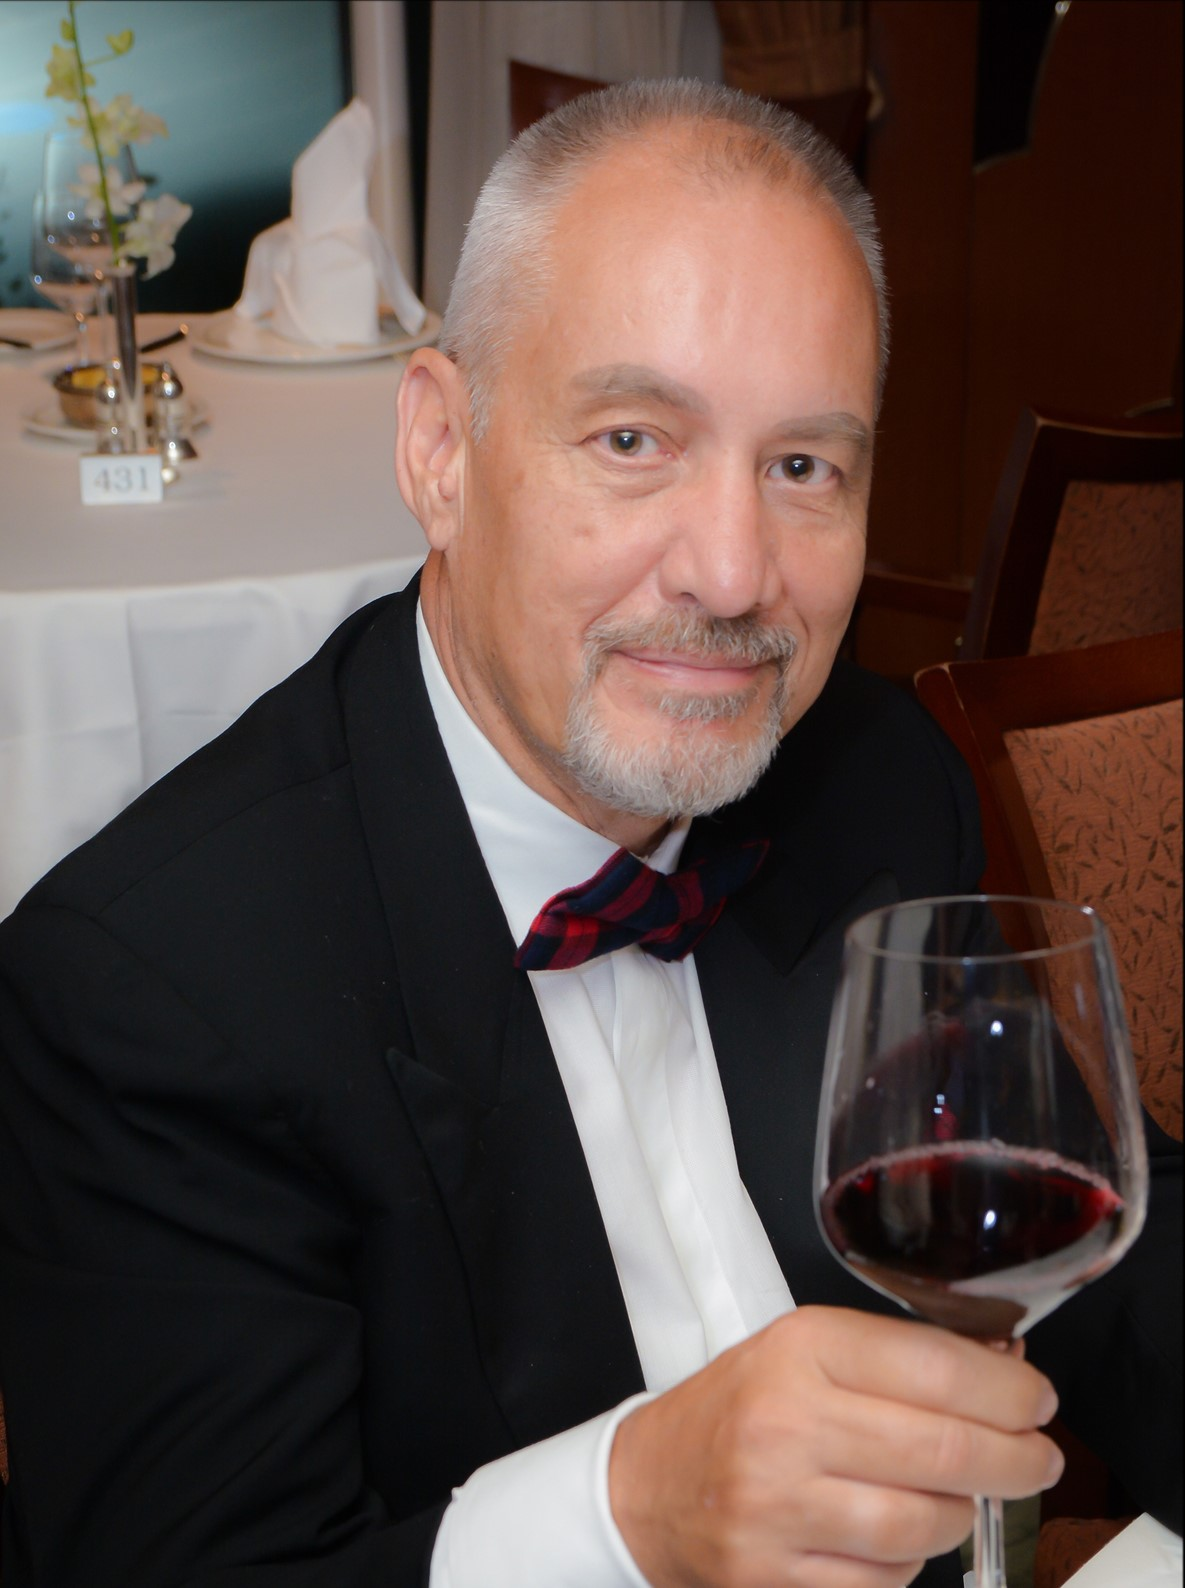 gg2414's avatar